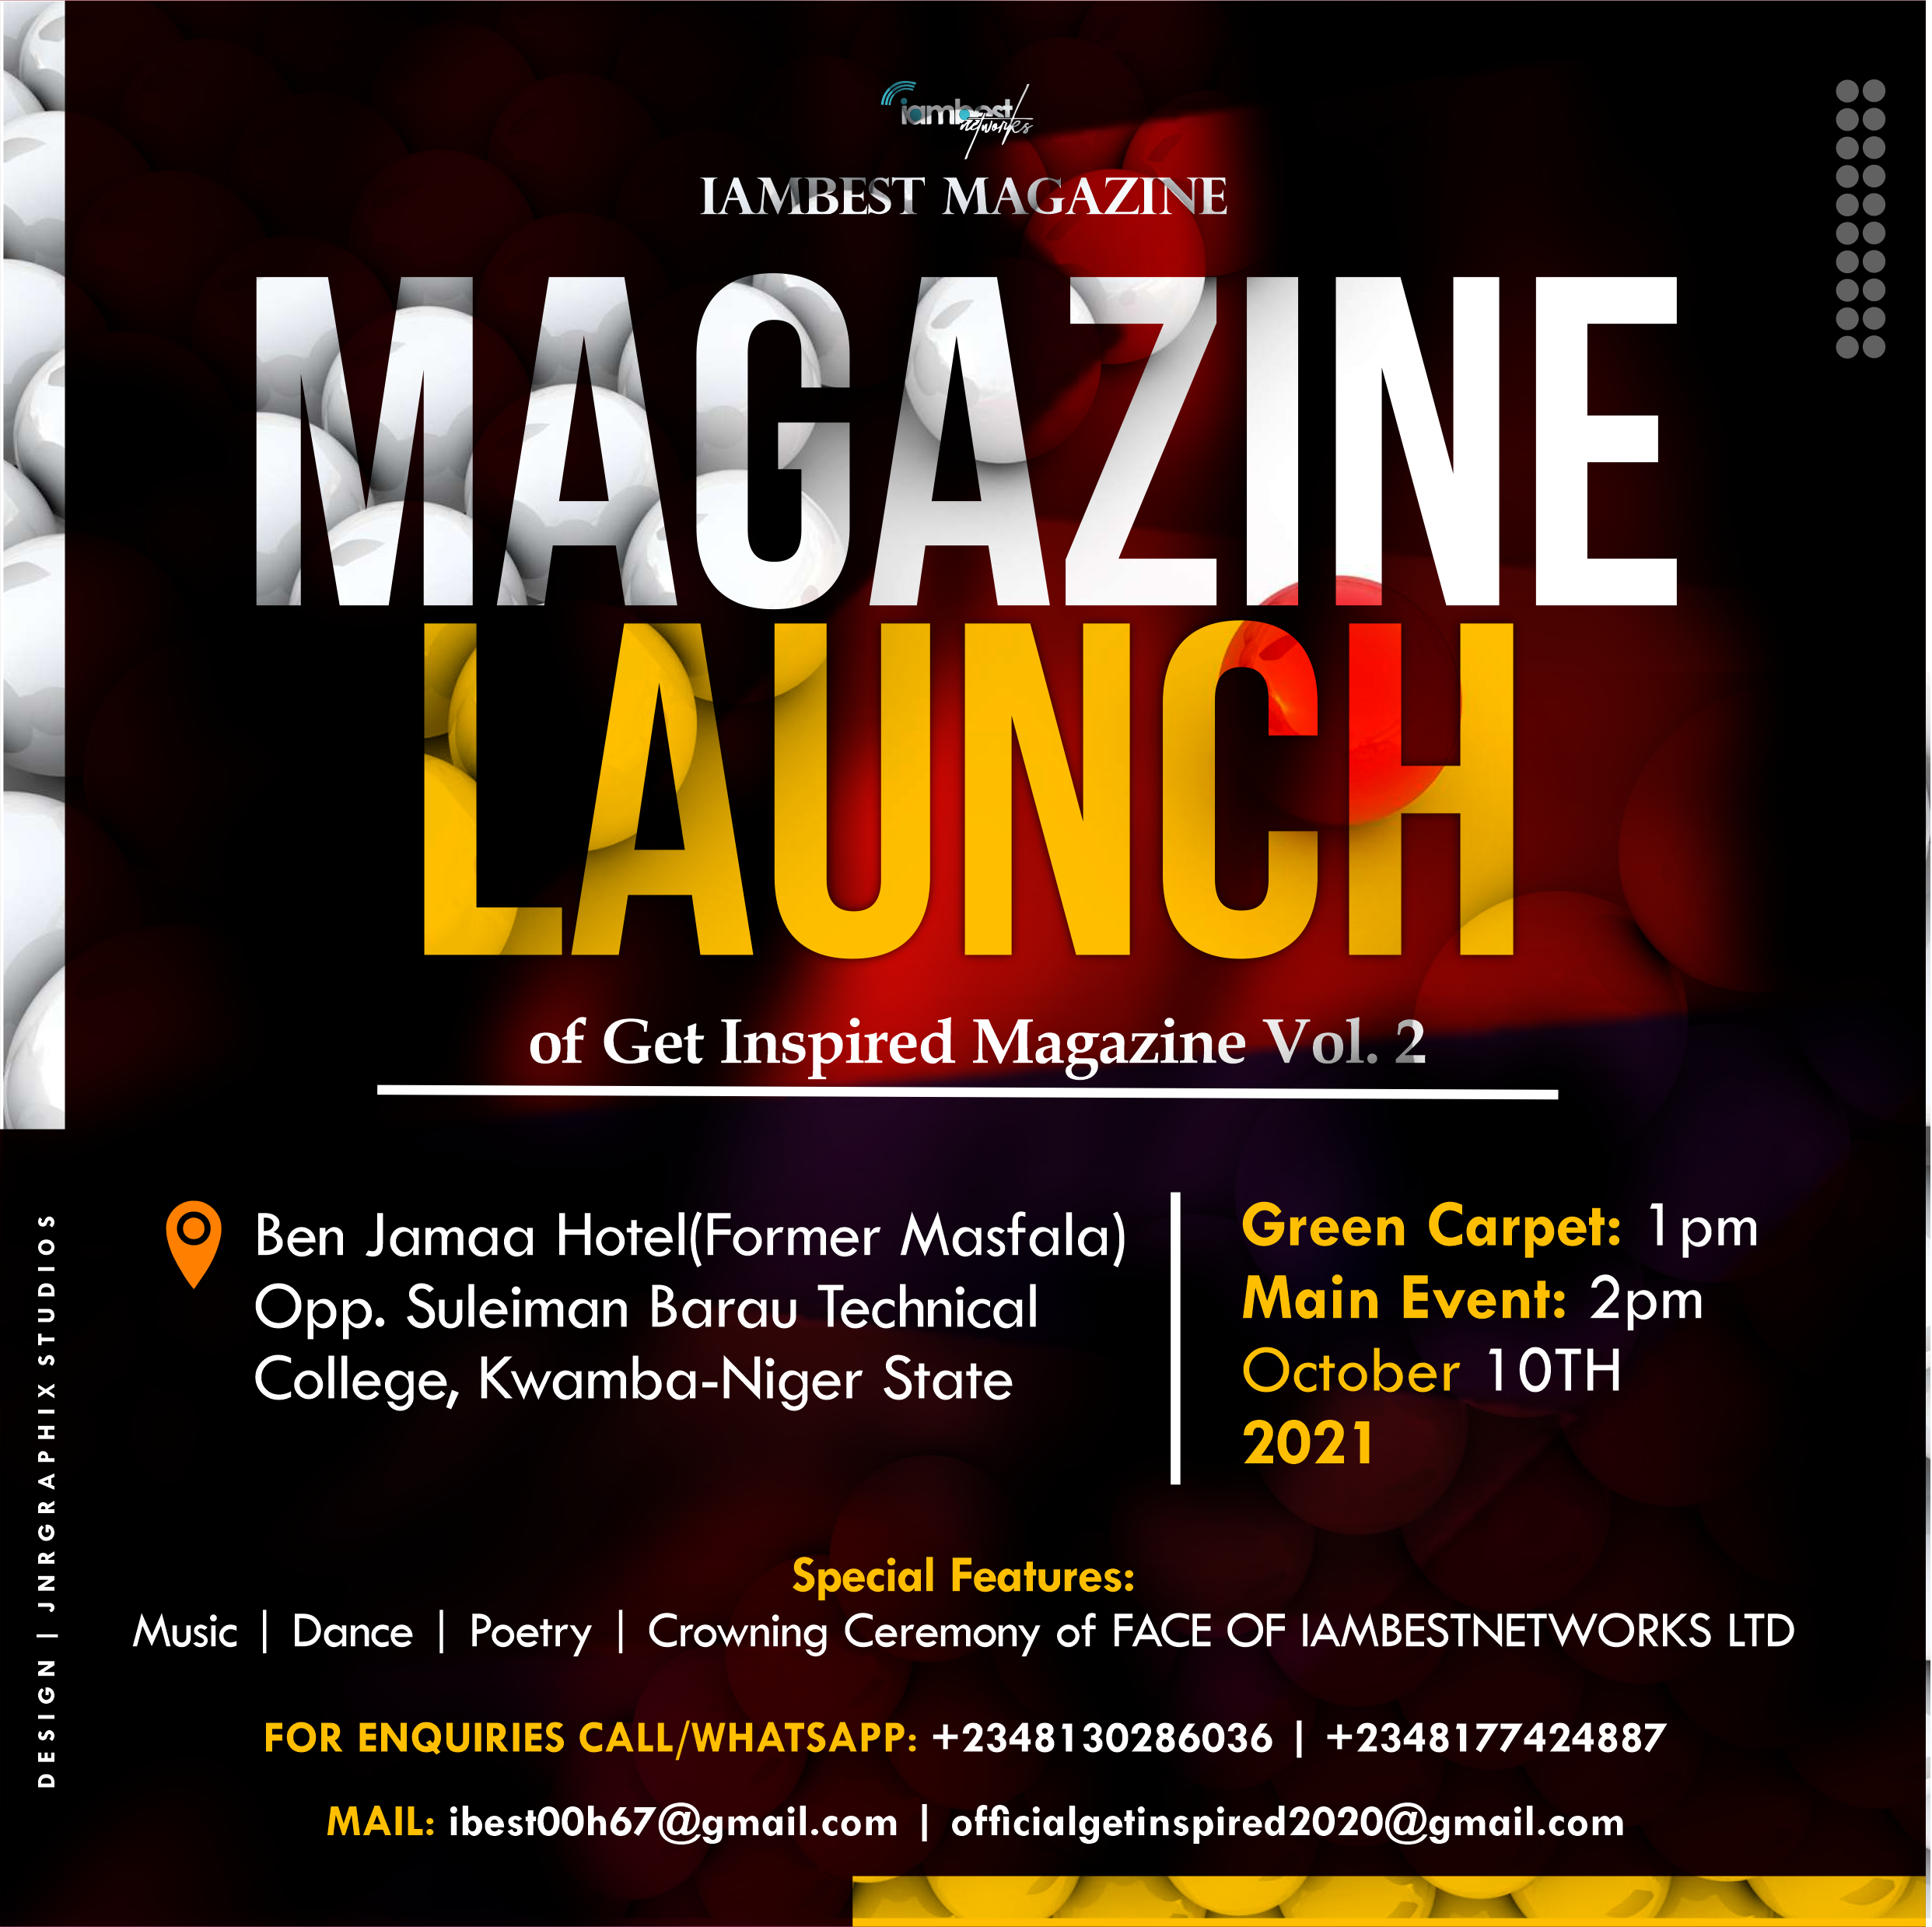 Details on the Get Inspired Magazine Vol. 2 of IAMBEST MAGAZINE